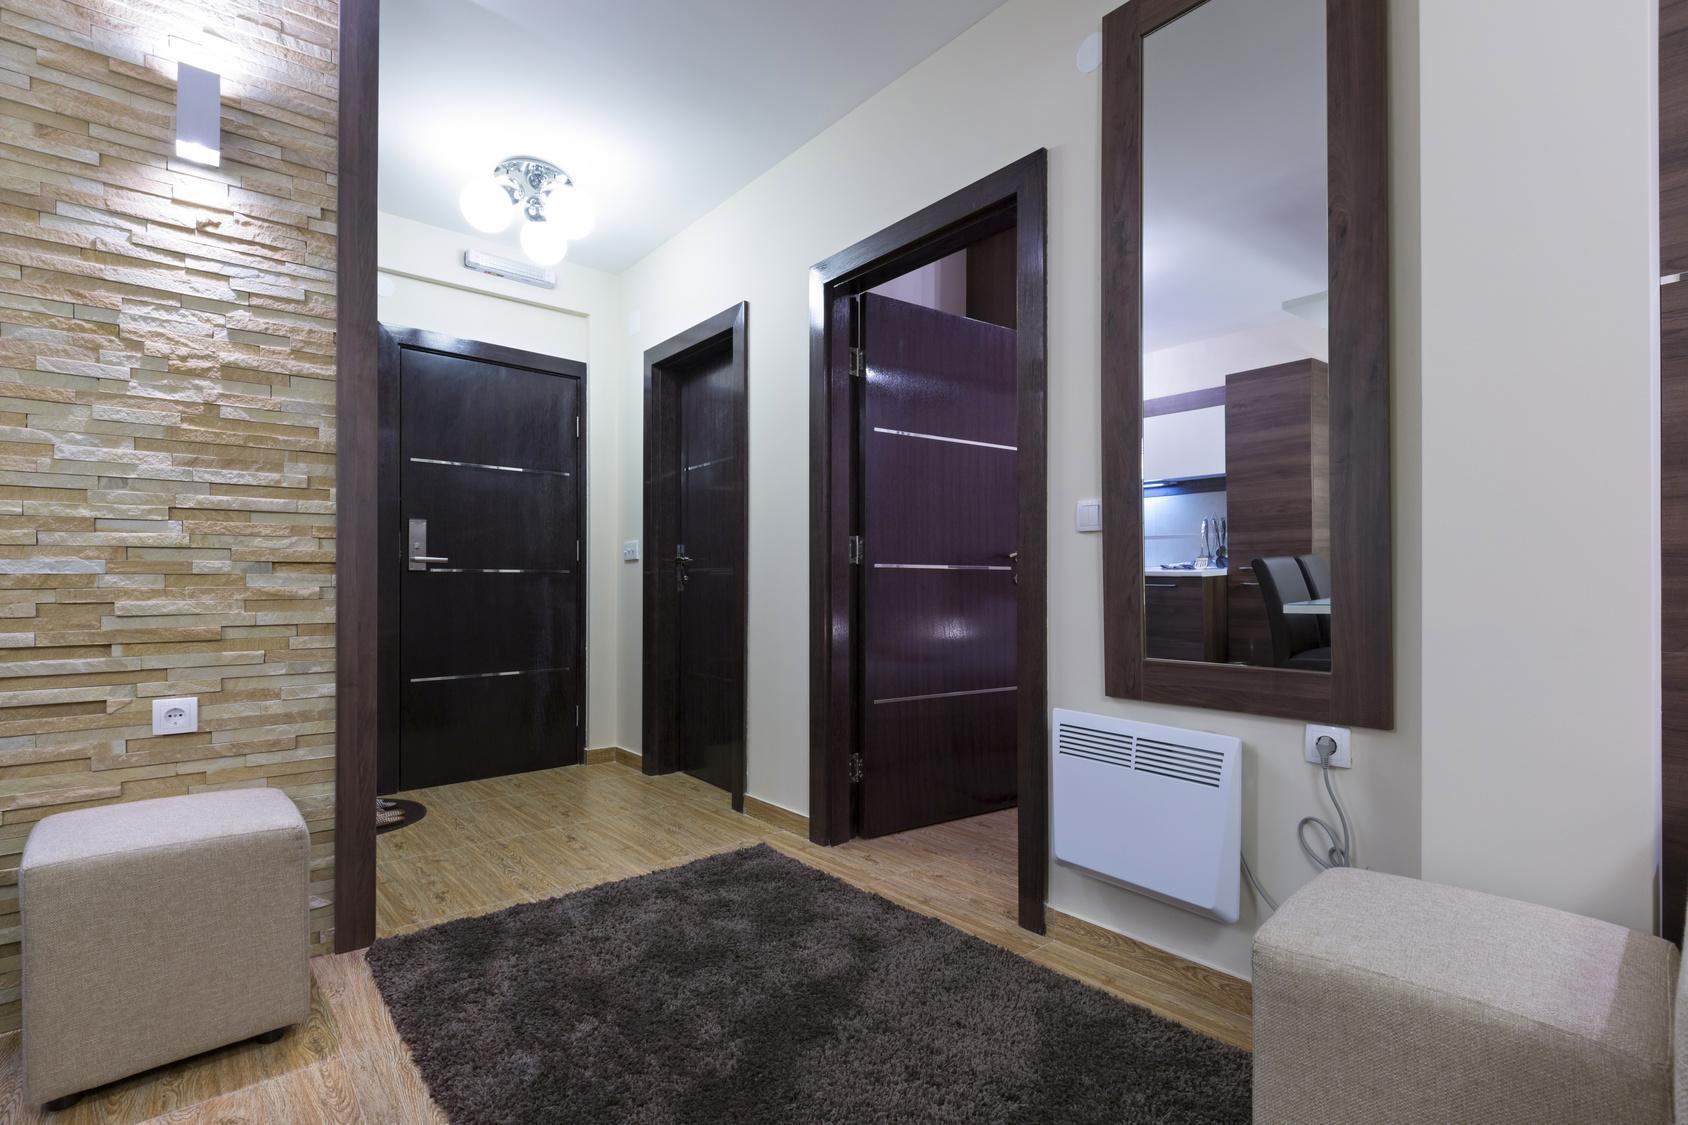 hotelimmobilien reba immobilien ag berlin kassel immobilienmakler hotelmakler. Black Bedroom Furniture Sets. Home Design Ideas